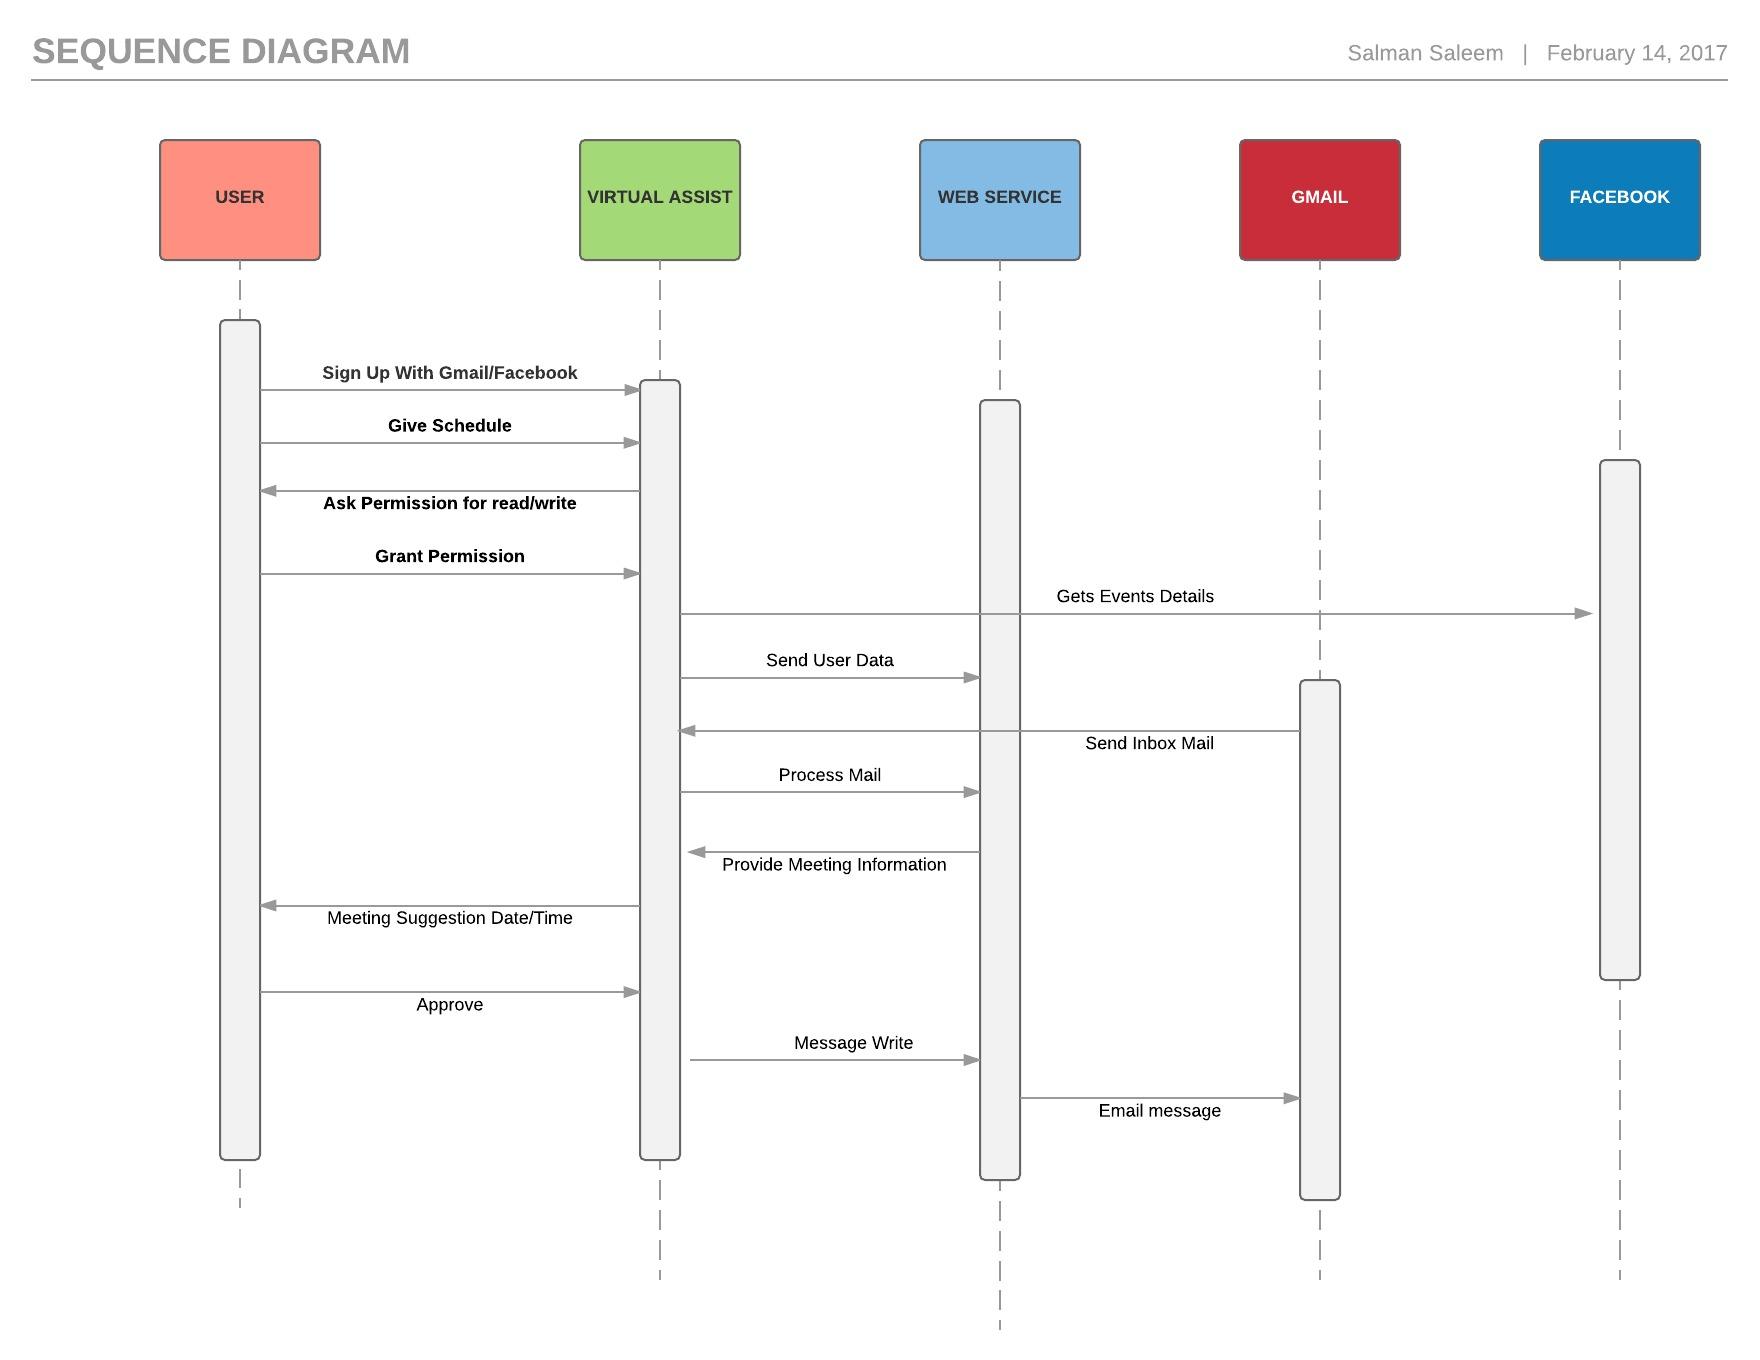 C:UserssalmanAppDataLocalMicrosoftWindowsINetCacheContent.WordBasic Sequence Diagram - Page 1.jpeg